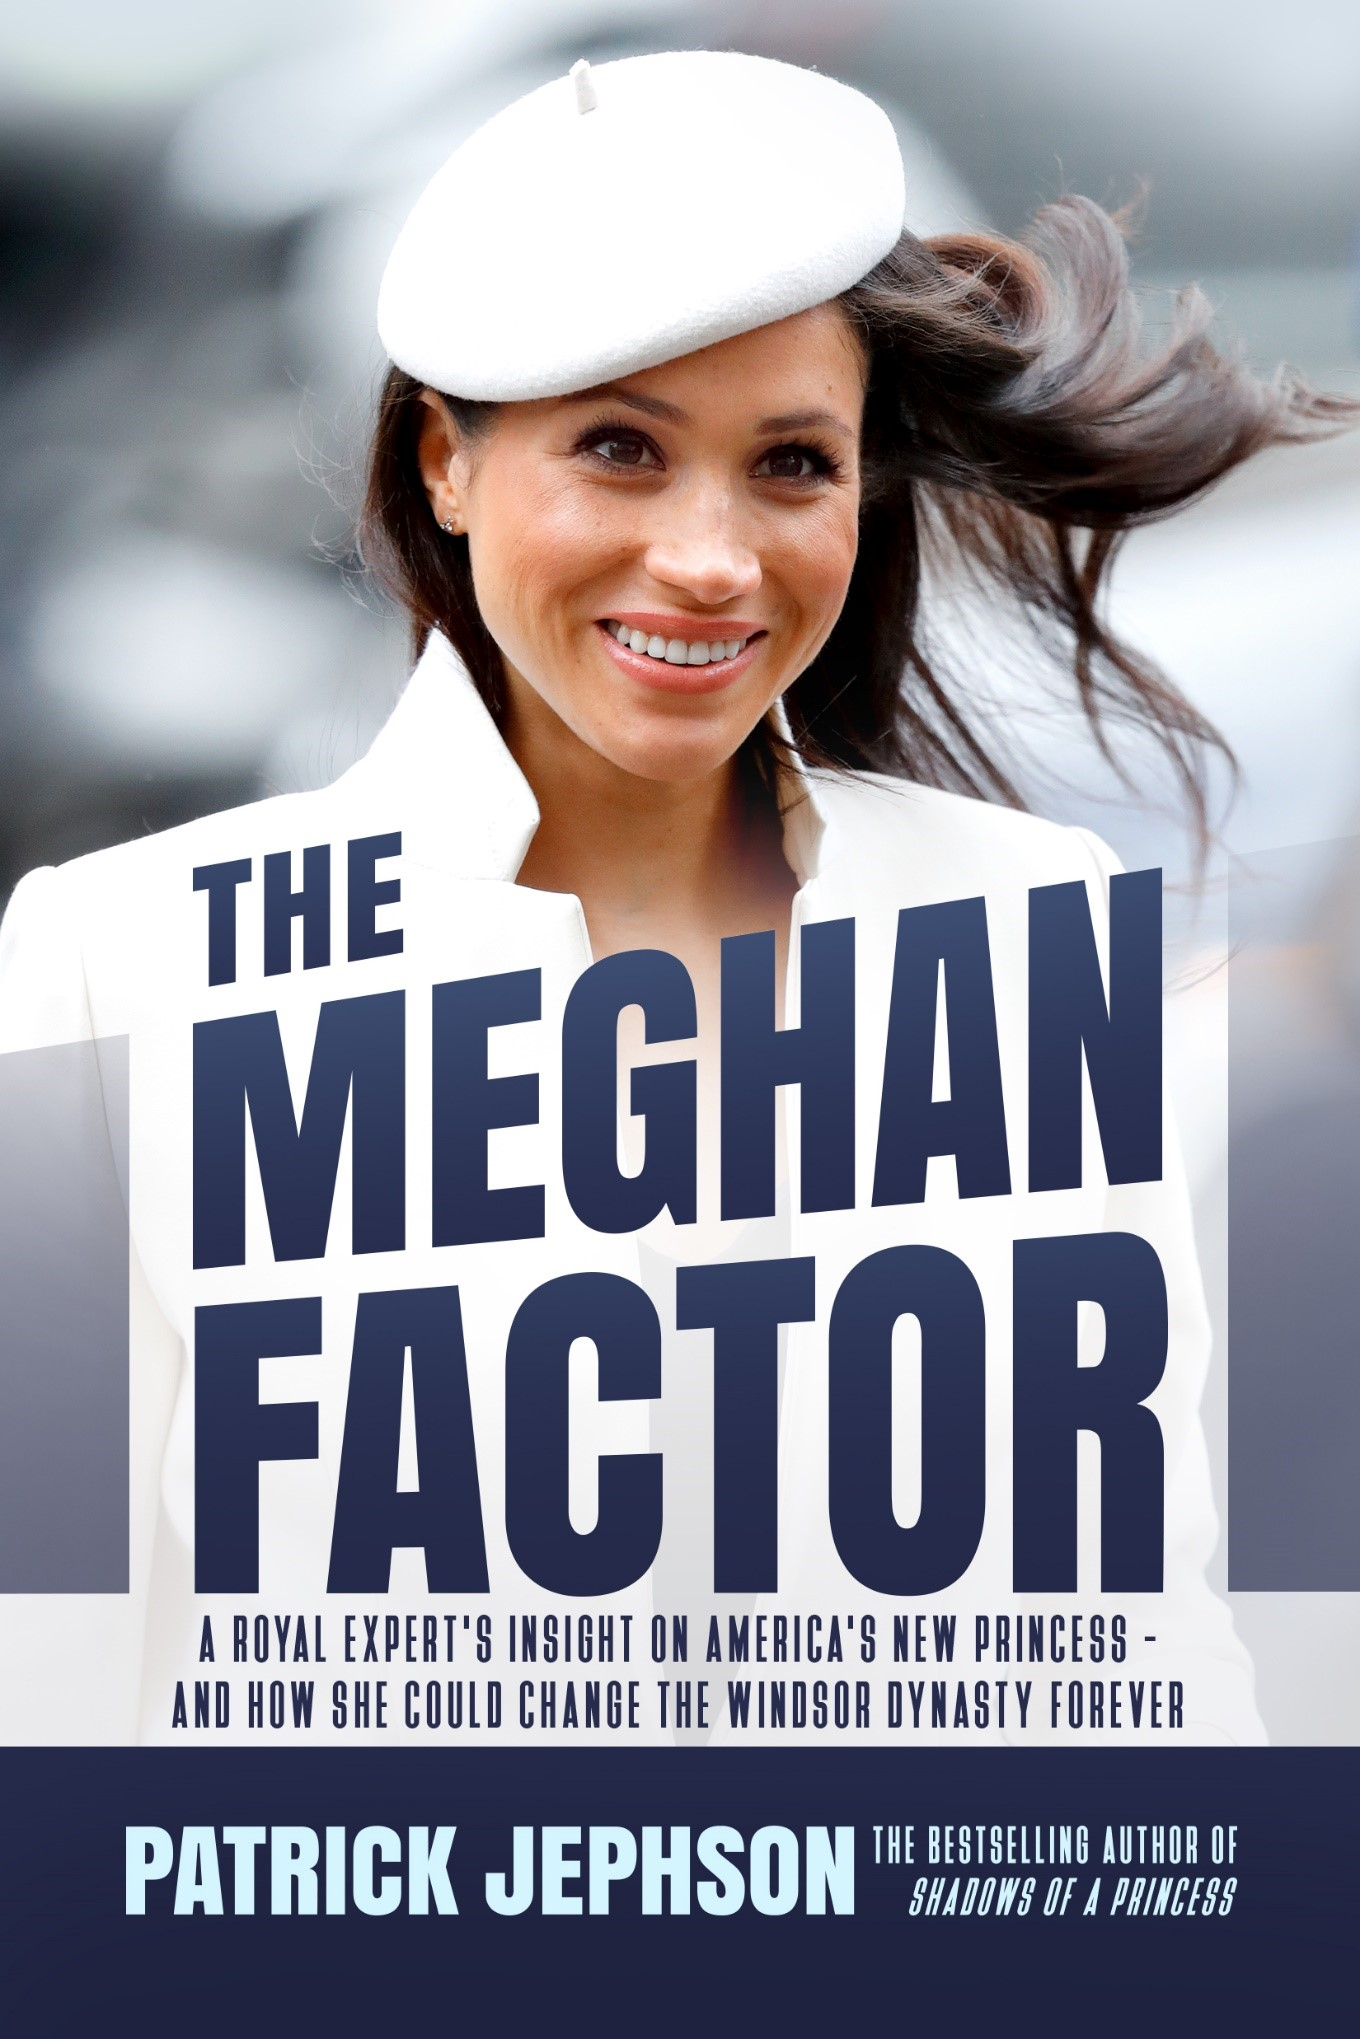 The Meghan Factor